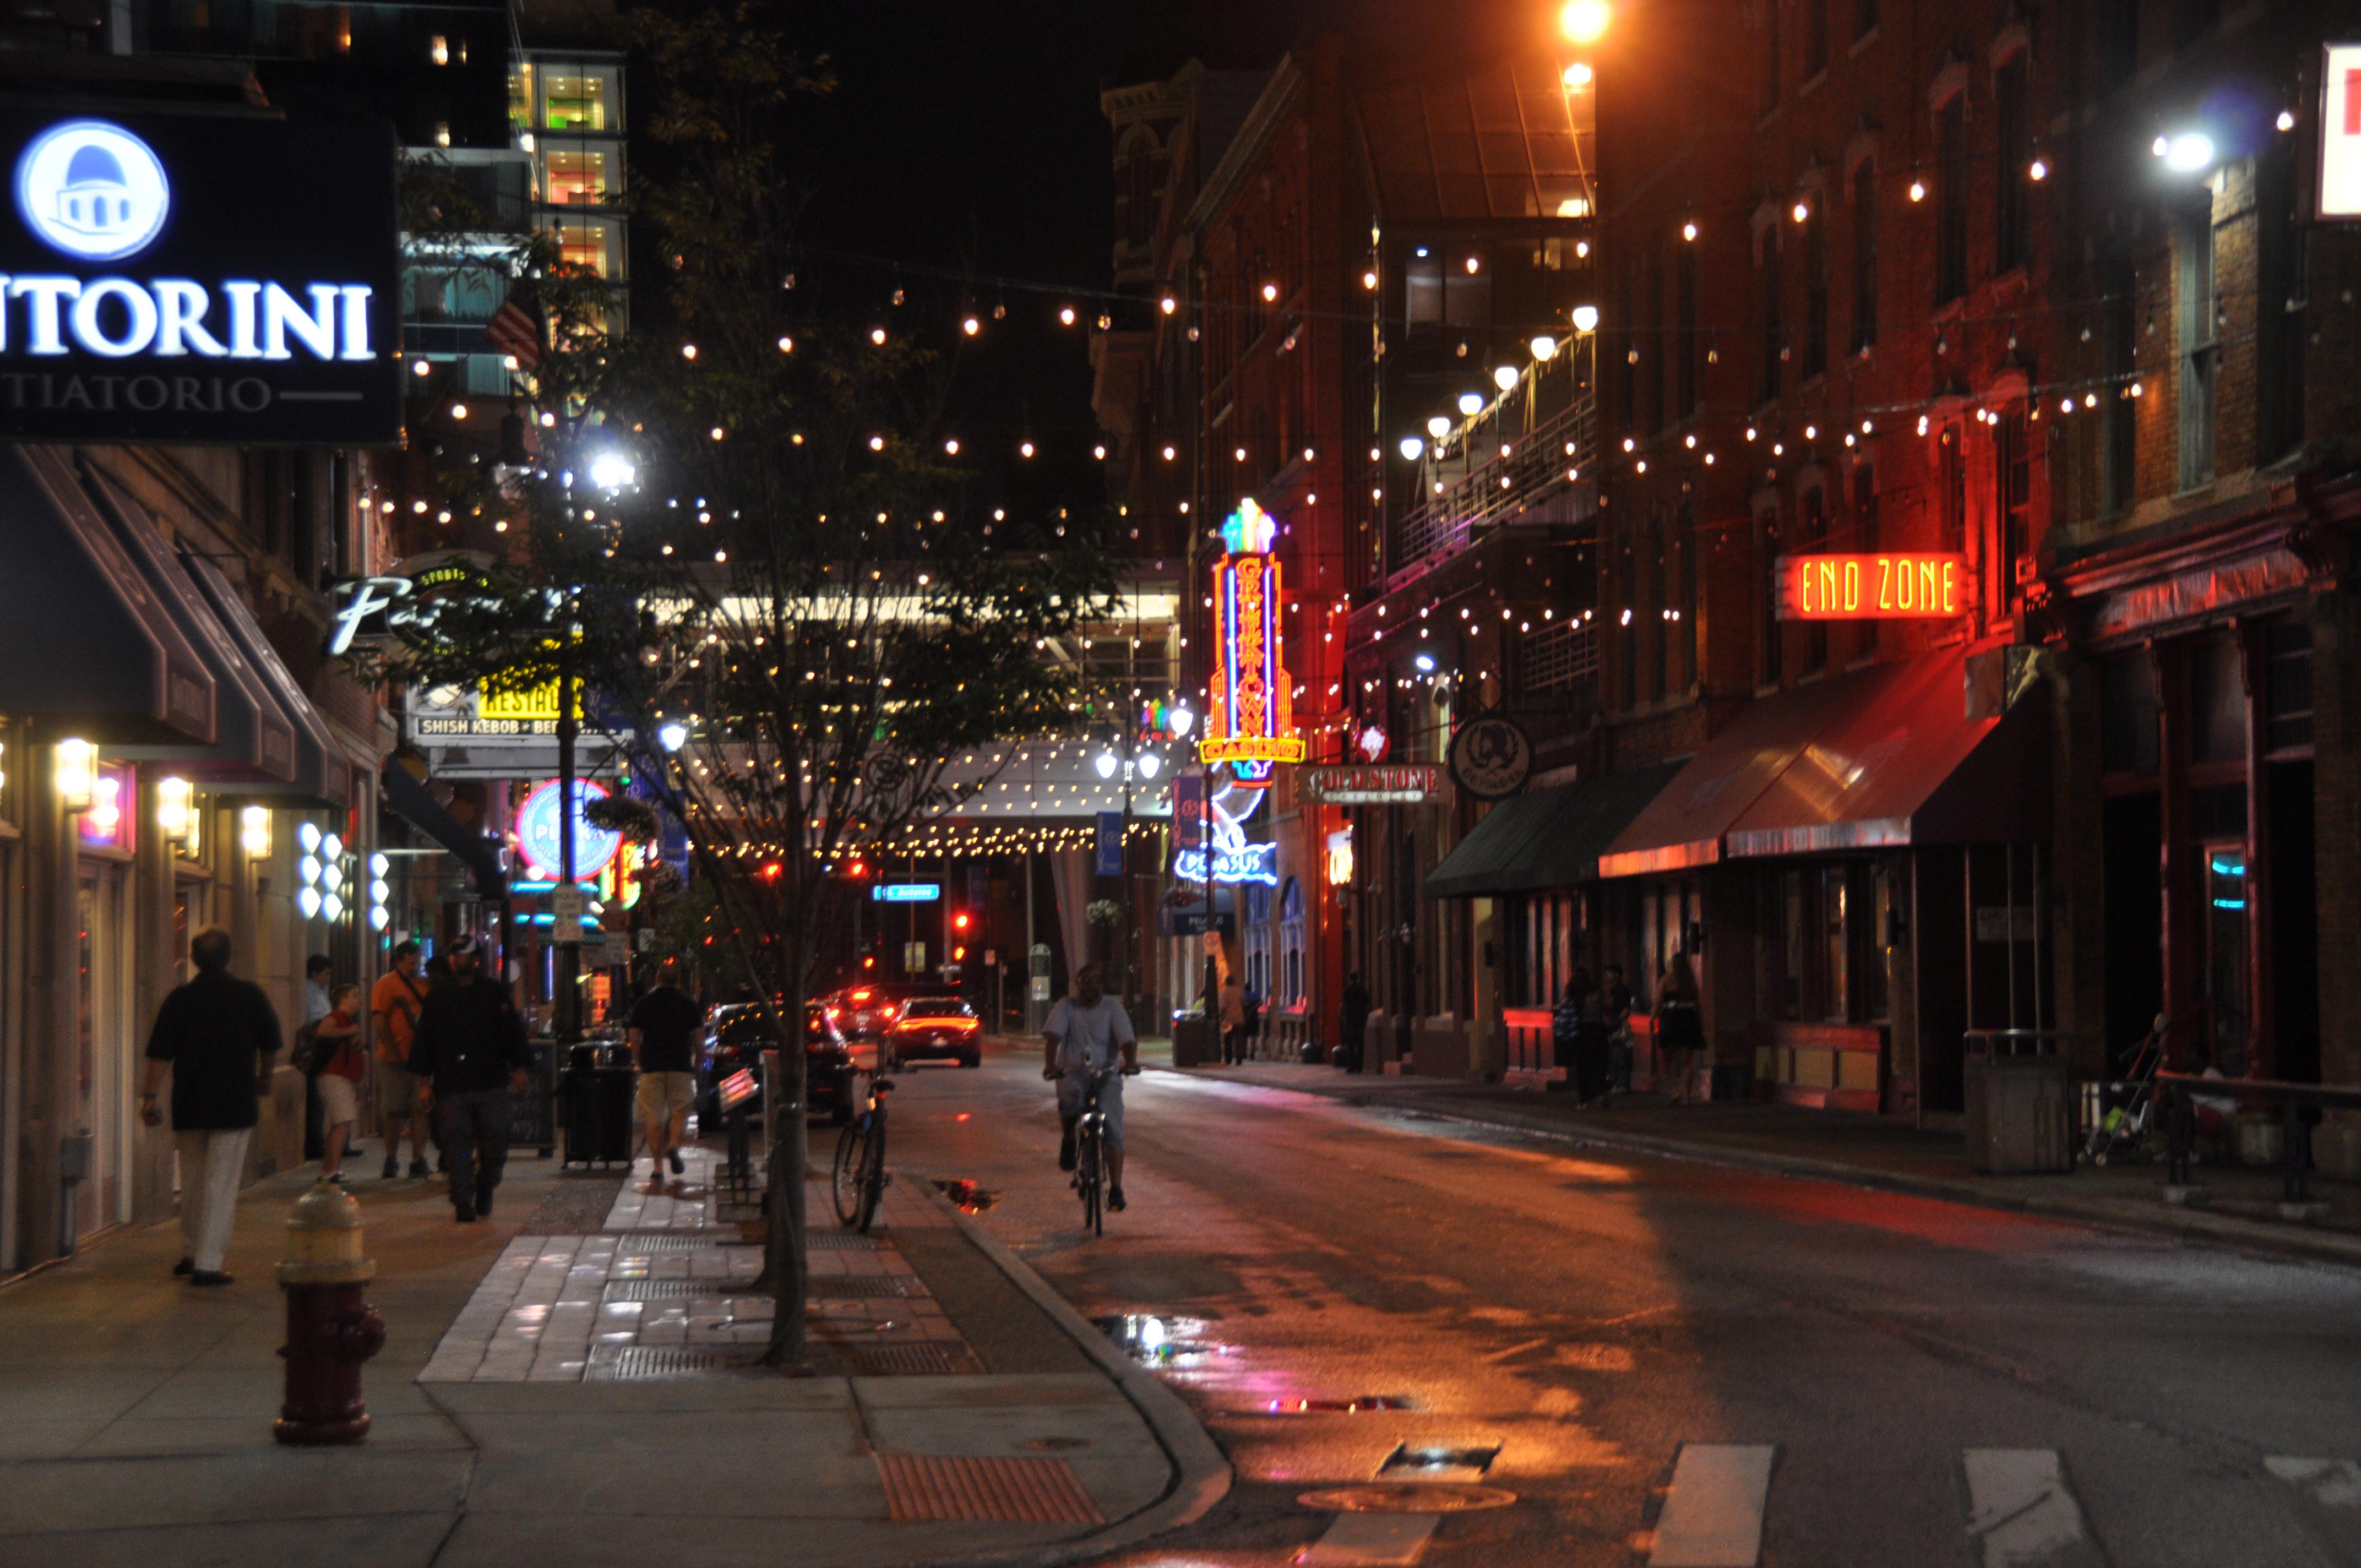 Greektown Detroit at night